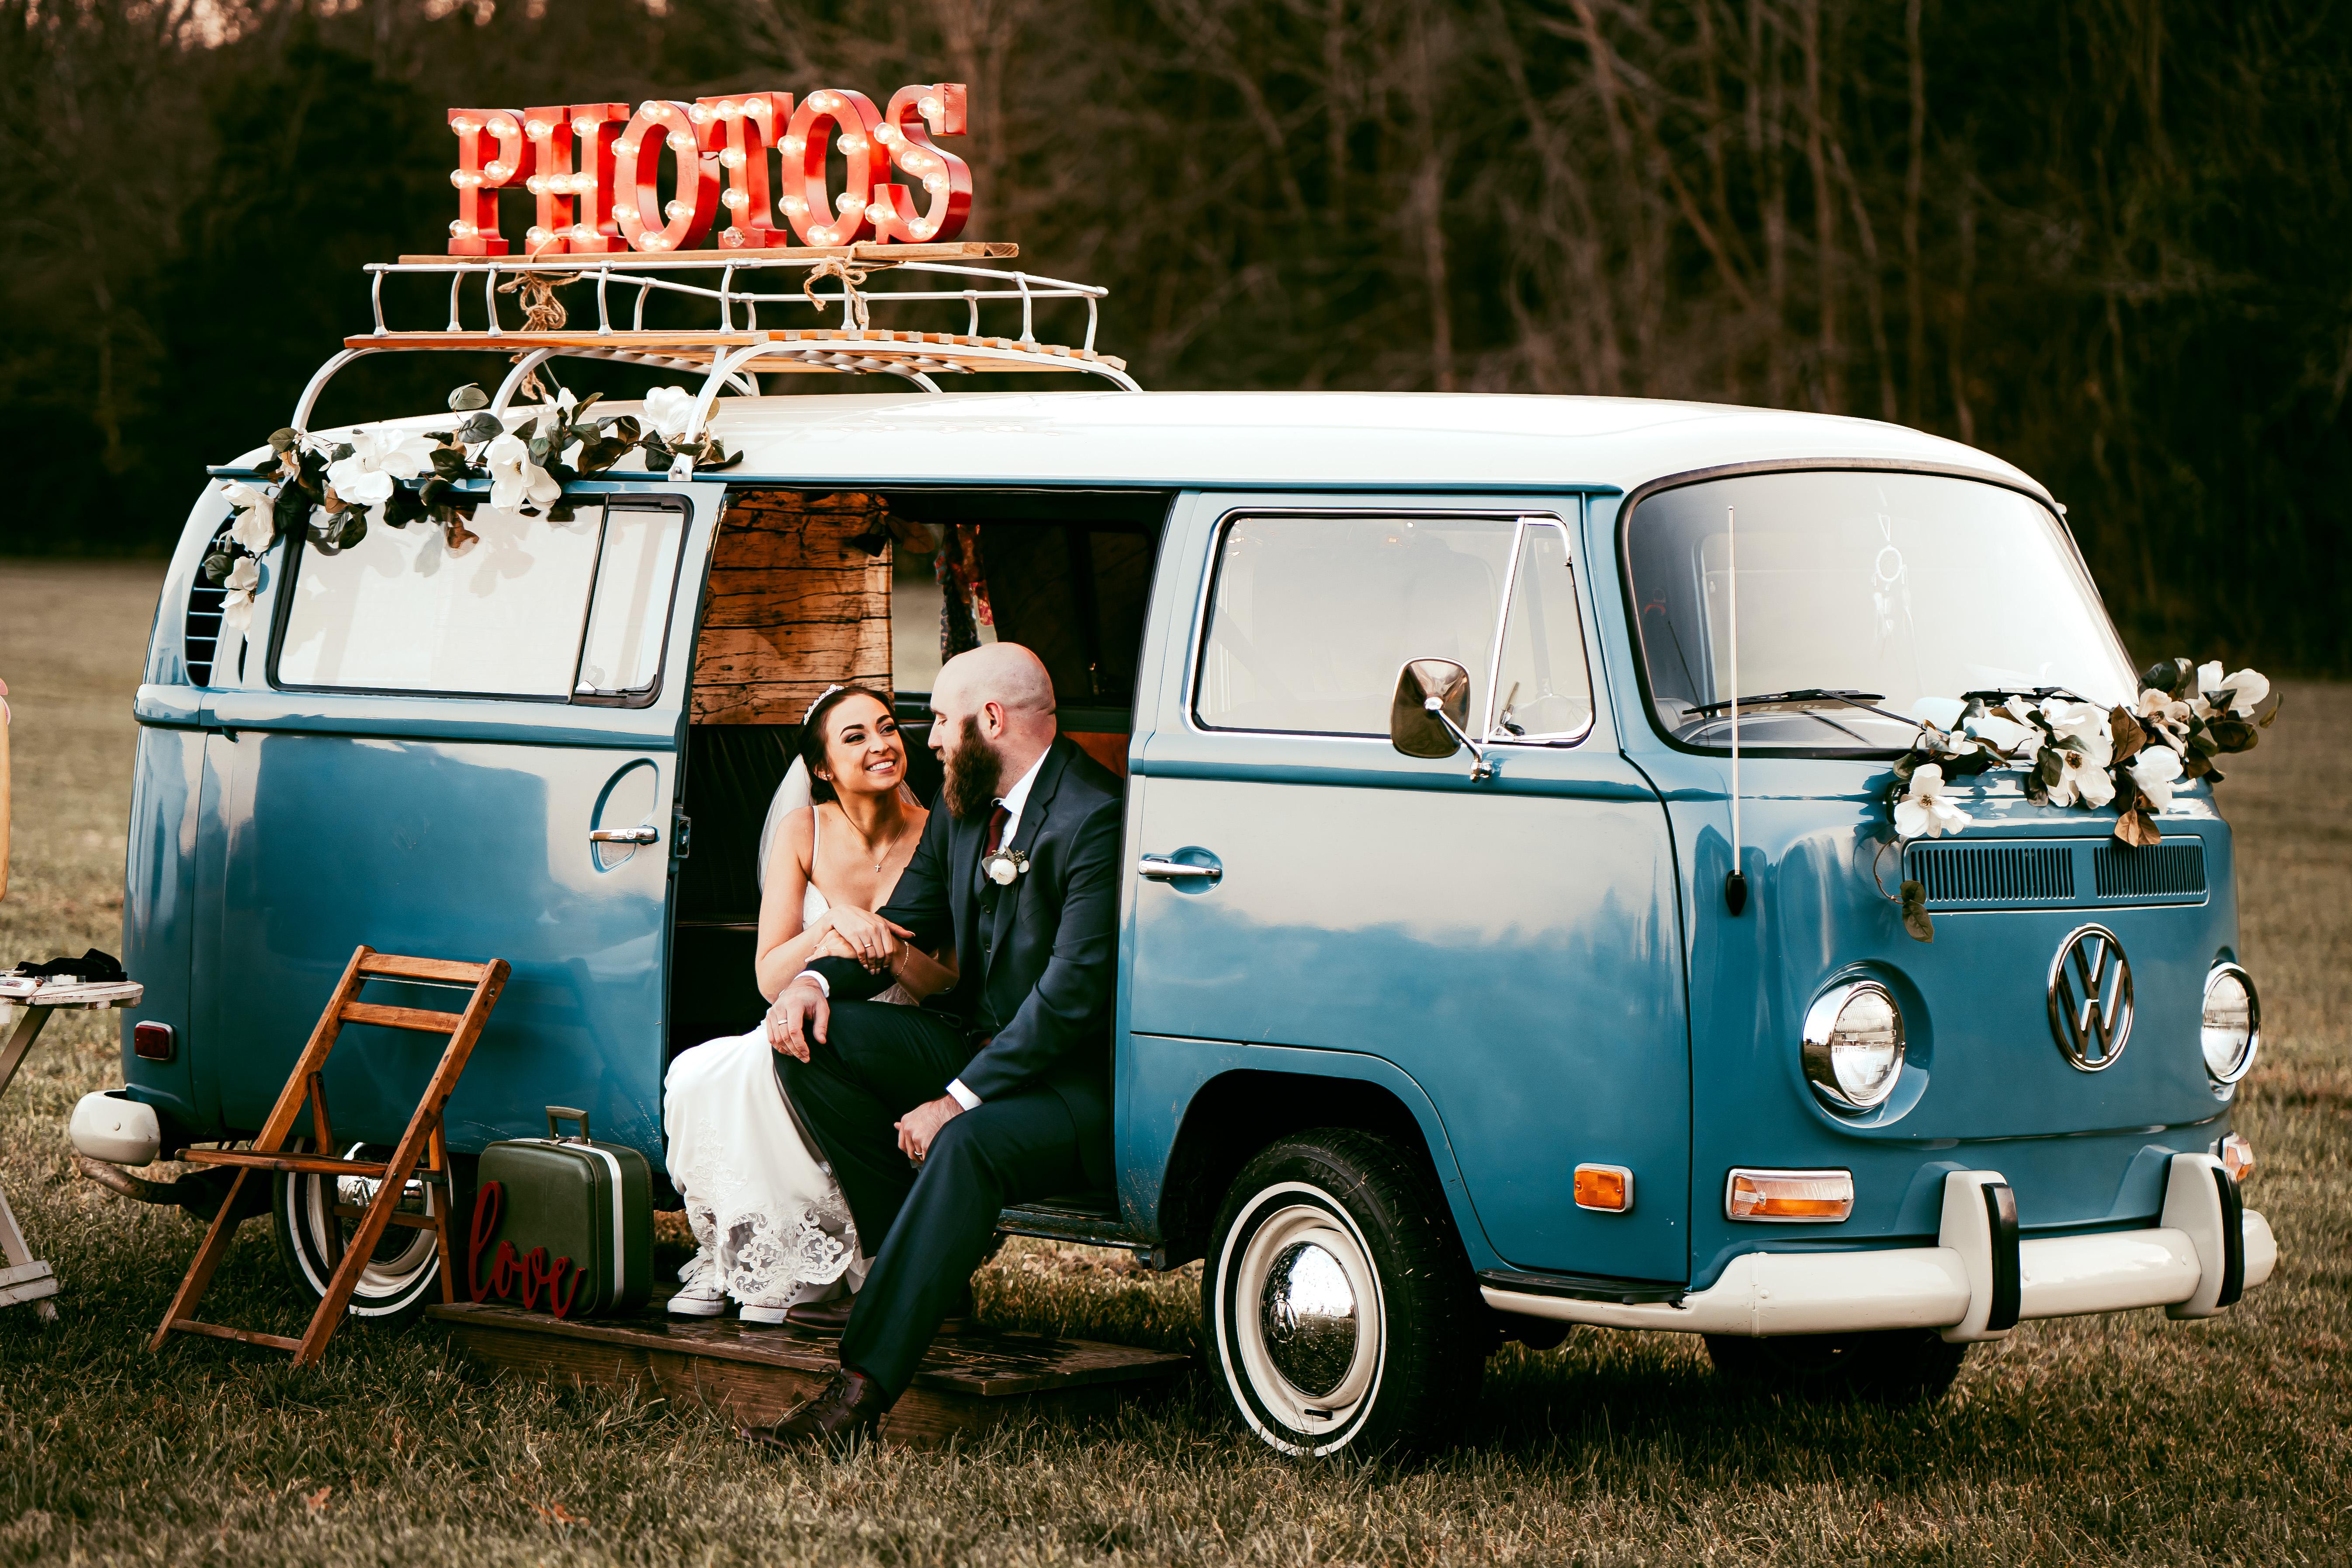 veritas photobus perfect for a unique photobooth wedding experience